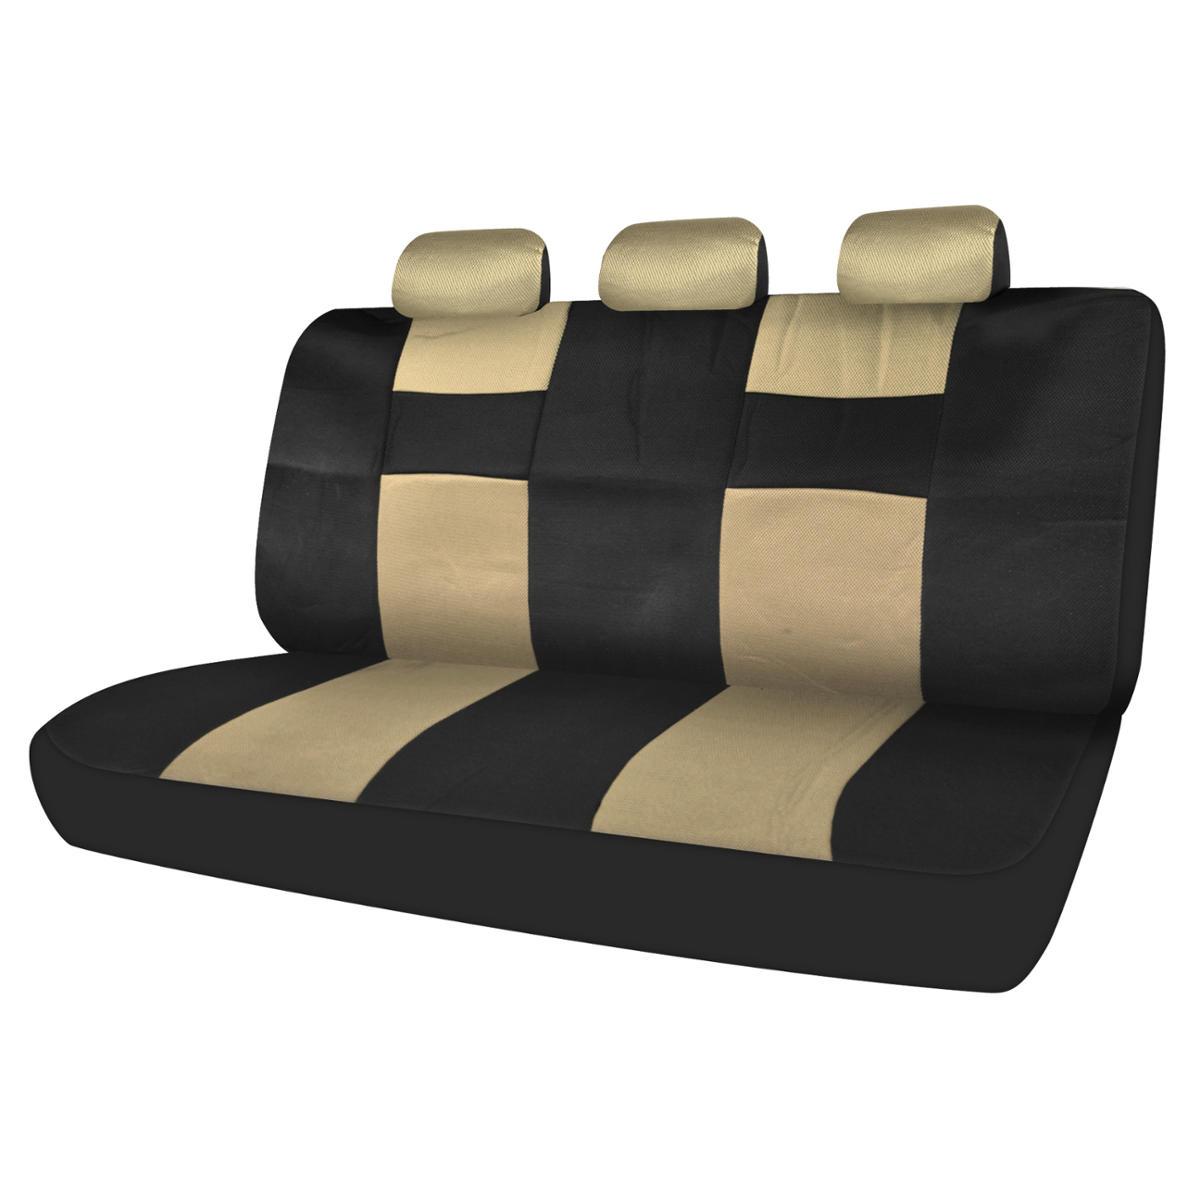 Buy Car Seat Covers Online Australia